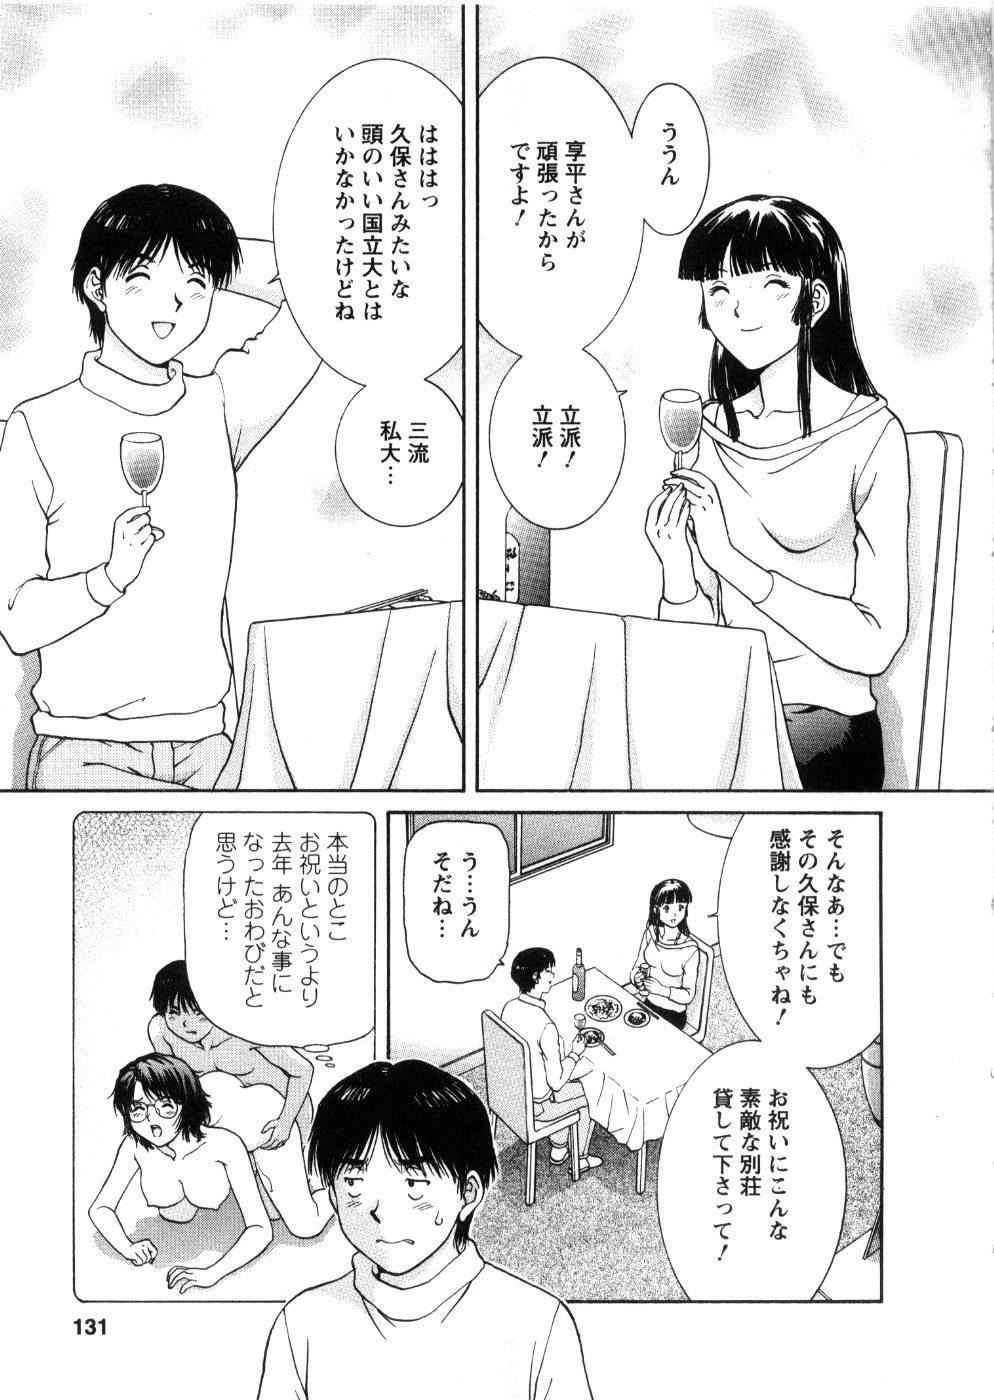 Oneechan-tachi ga Yatte Kuru 03 132